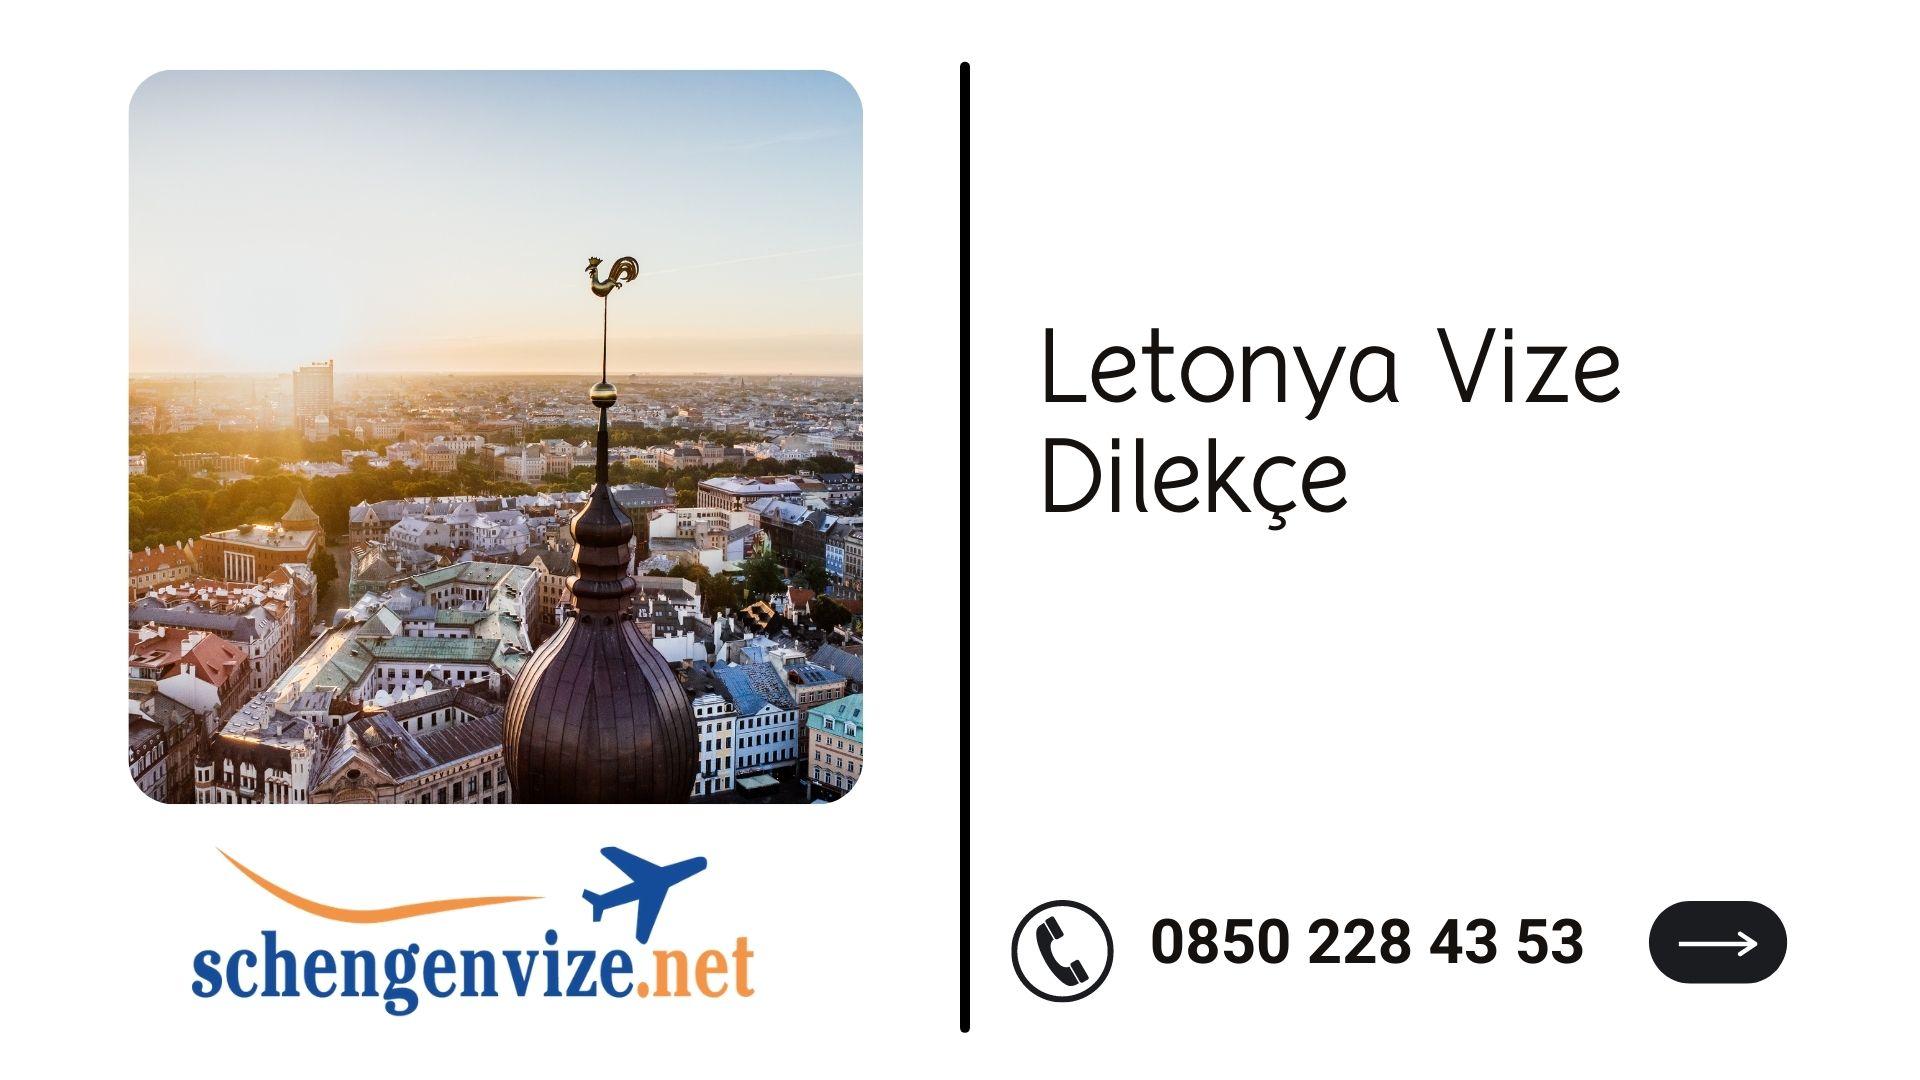 Letonya Vize Dilekçe